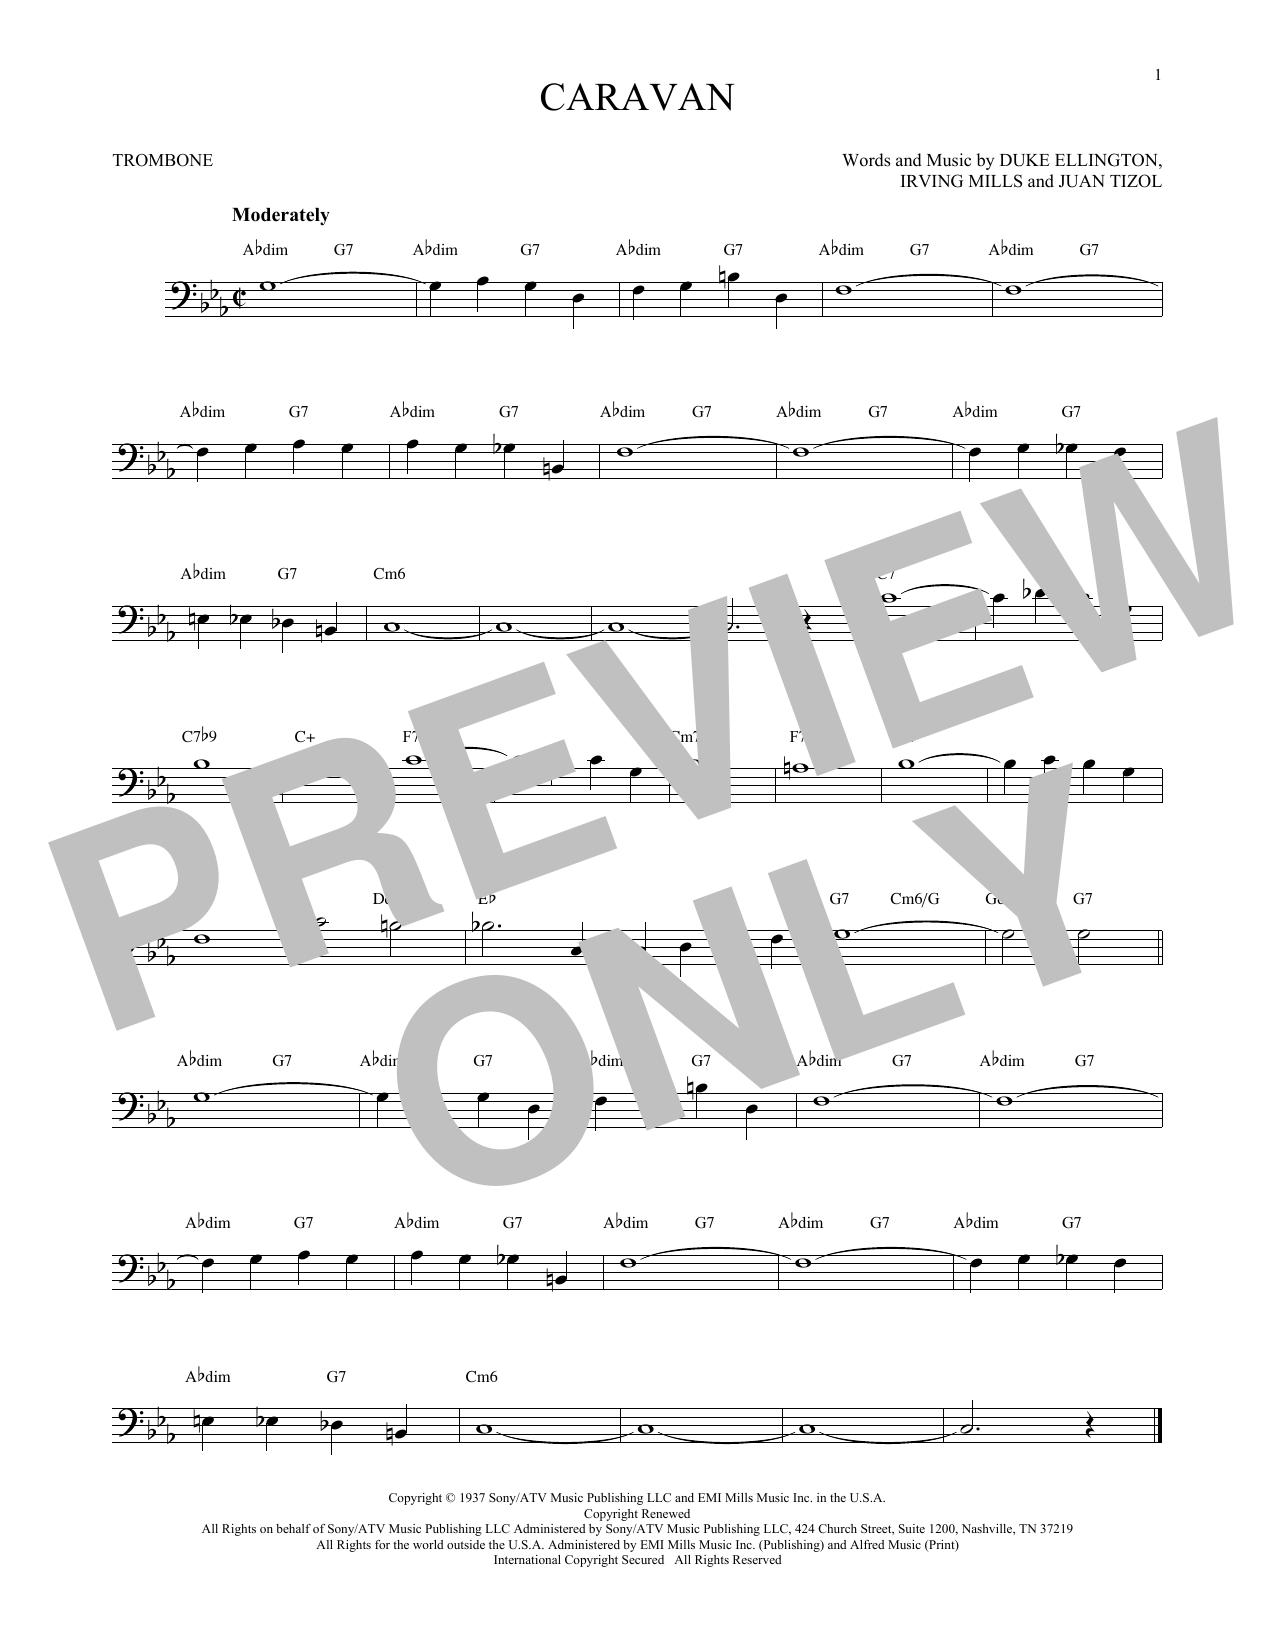 Juan Tizol Duke Ellington Caravan Sheet Music Notes Chords